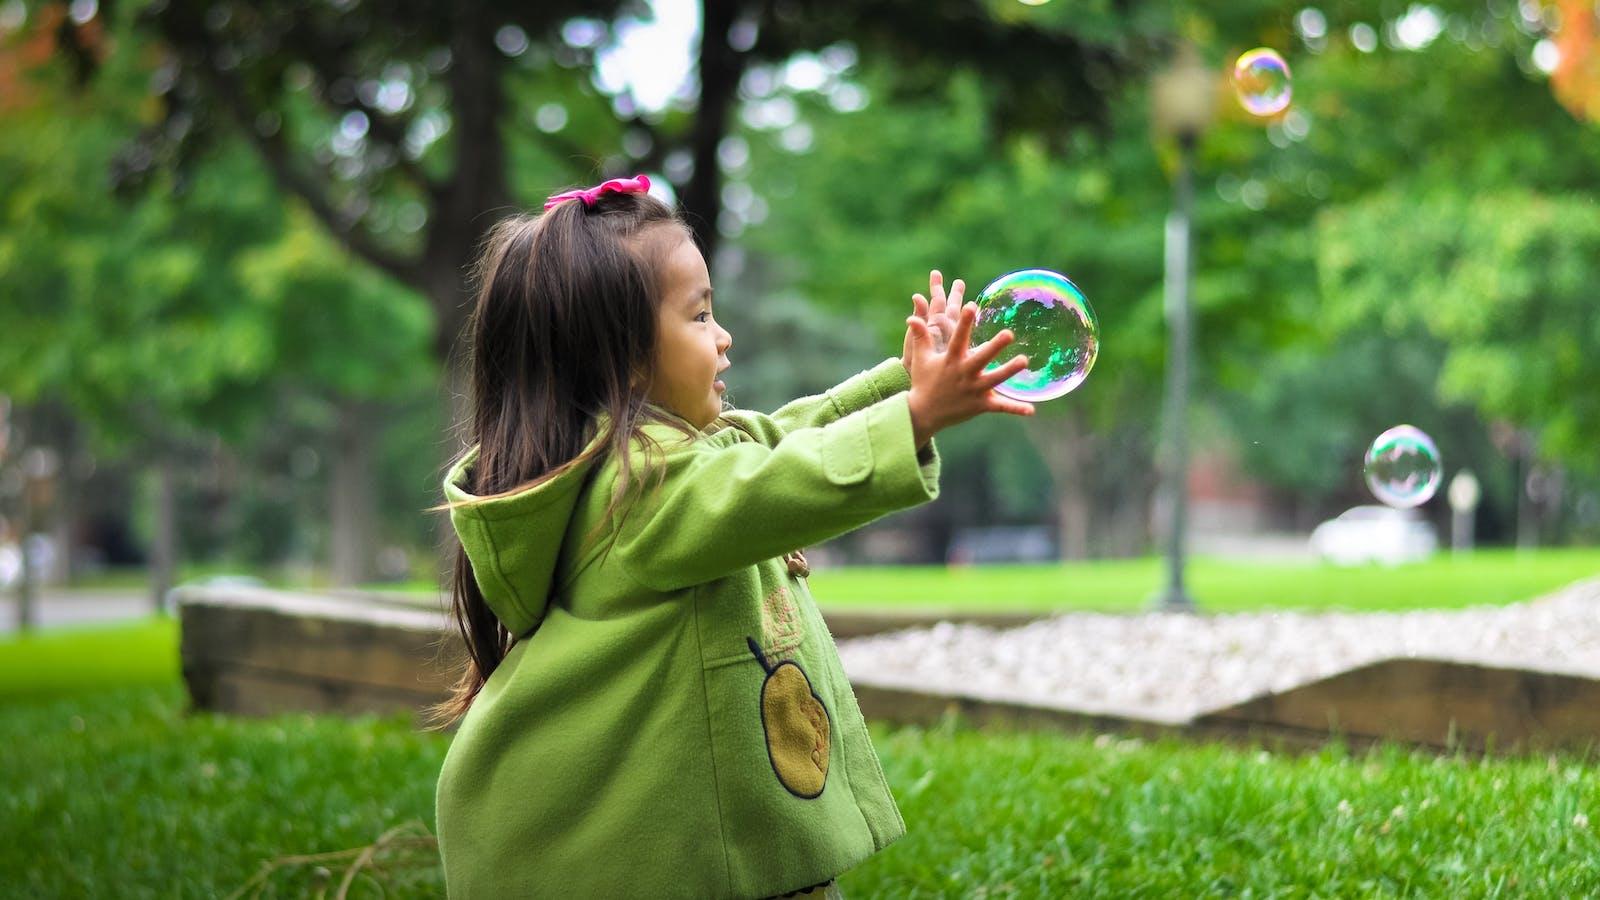 Parenting Is About Treasuring: Four Ways to Nurture Joy in God